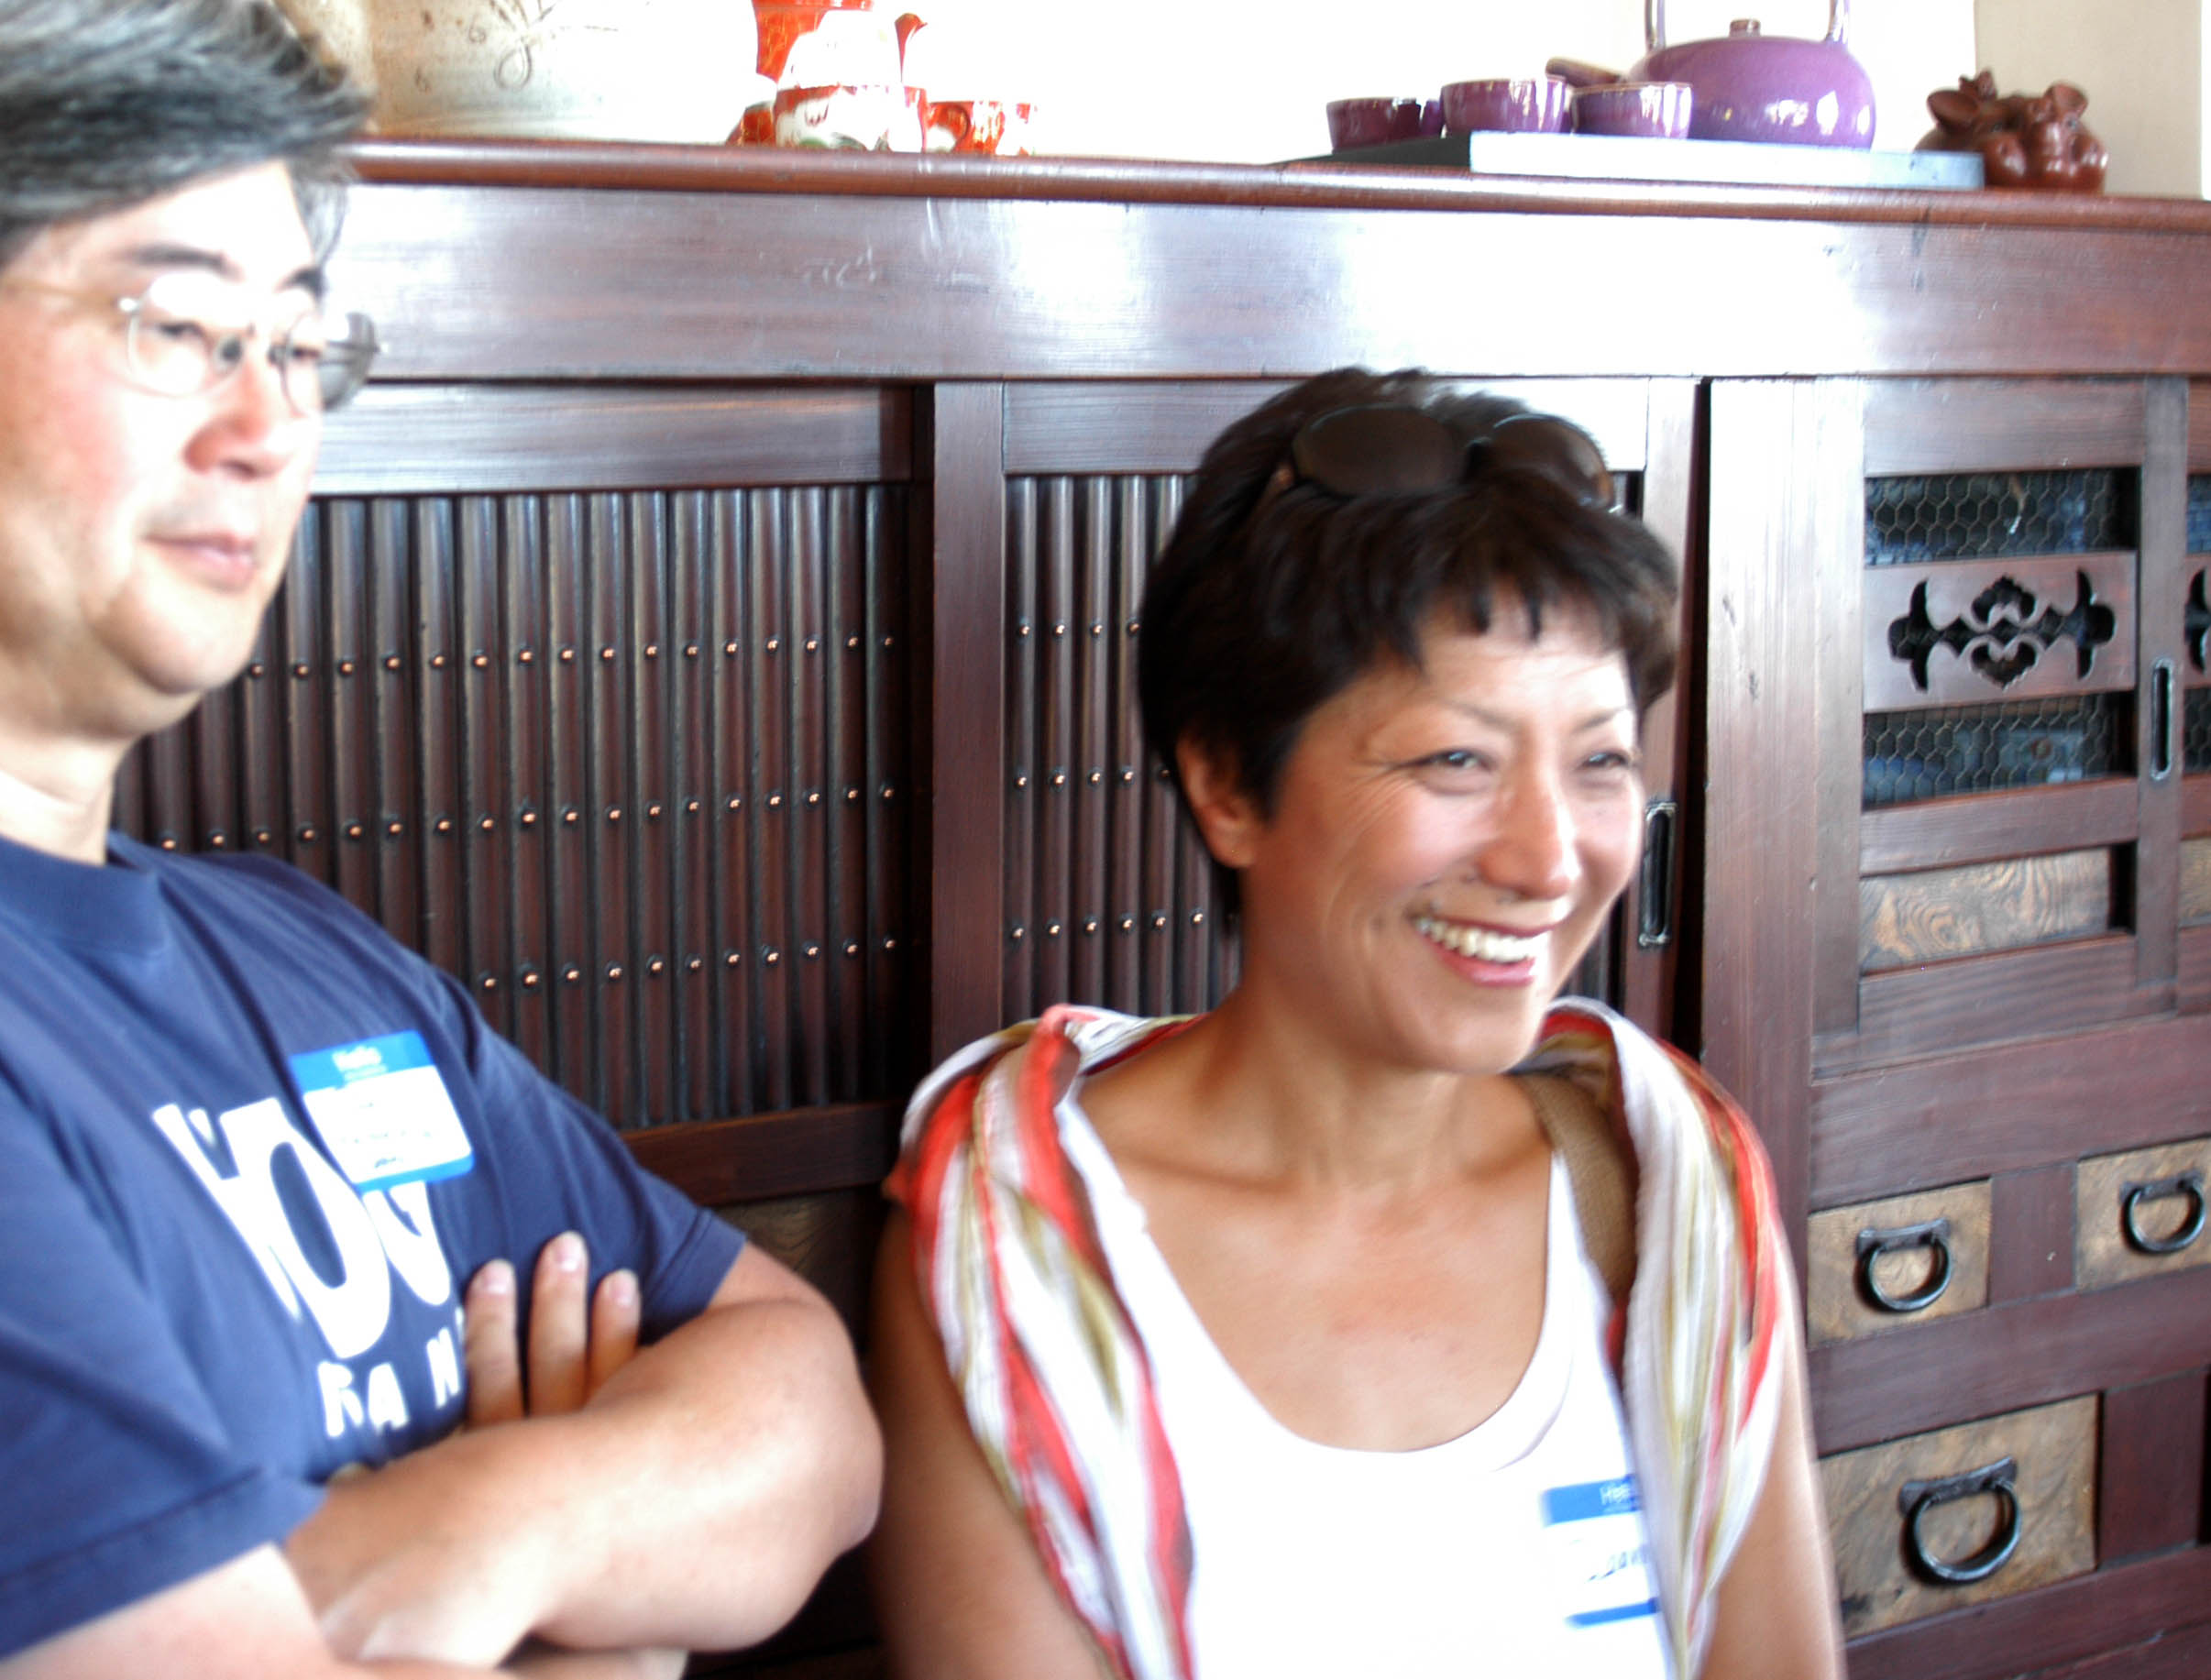 Paul Liem, president of Korea Policy Institute (www.kpolicy.org), and filmmaker Deanne Borshay Liem (www.mufilms.org)